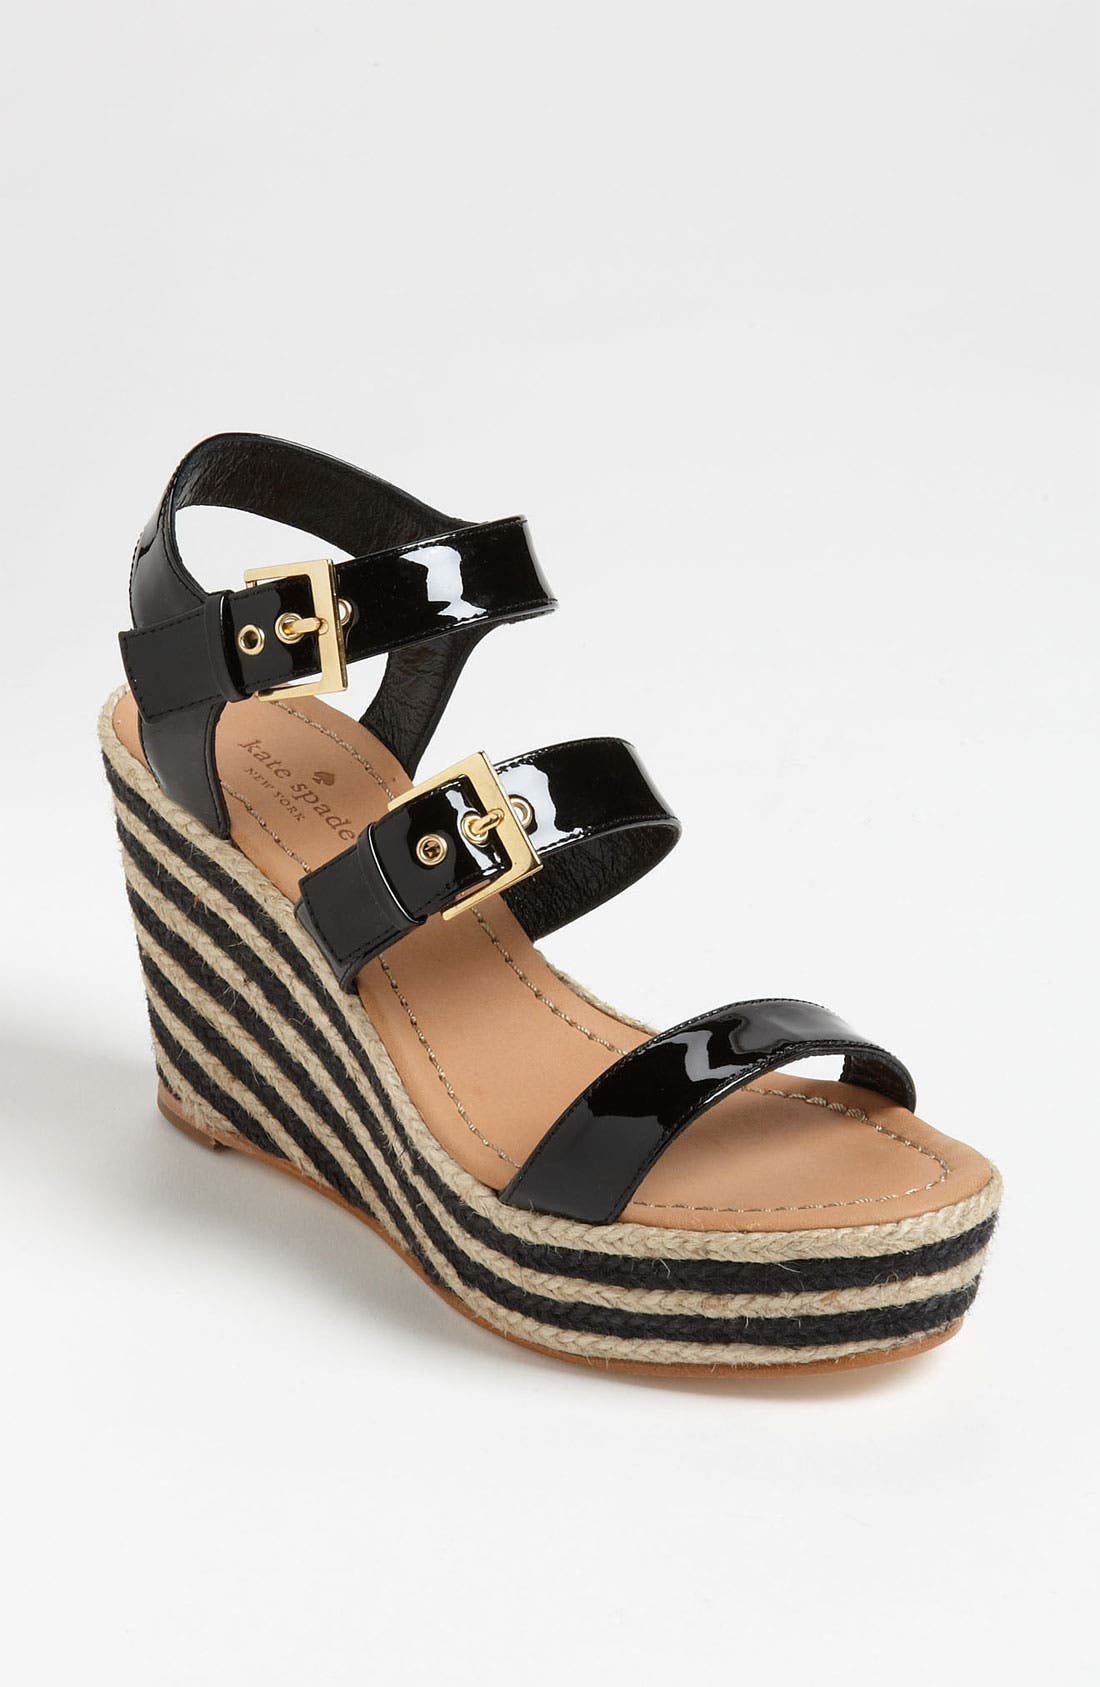 KATE SPADE NEW YORK, 'darla' sandal, Main thumbnail 1, color, 001